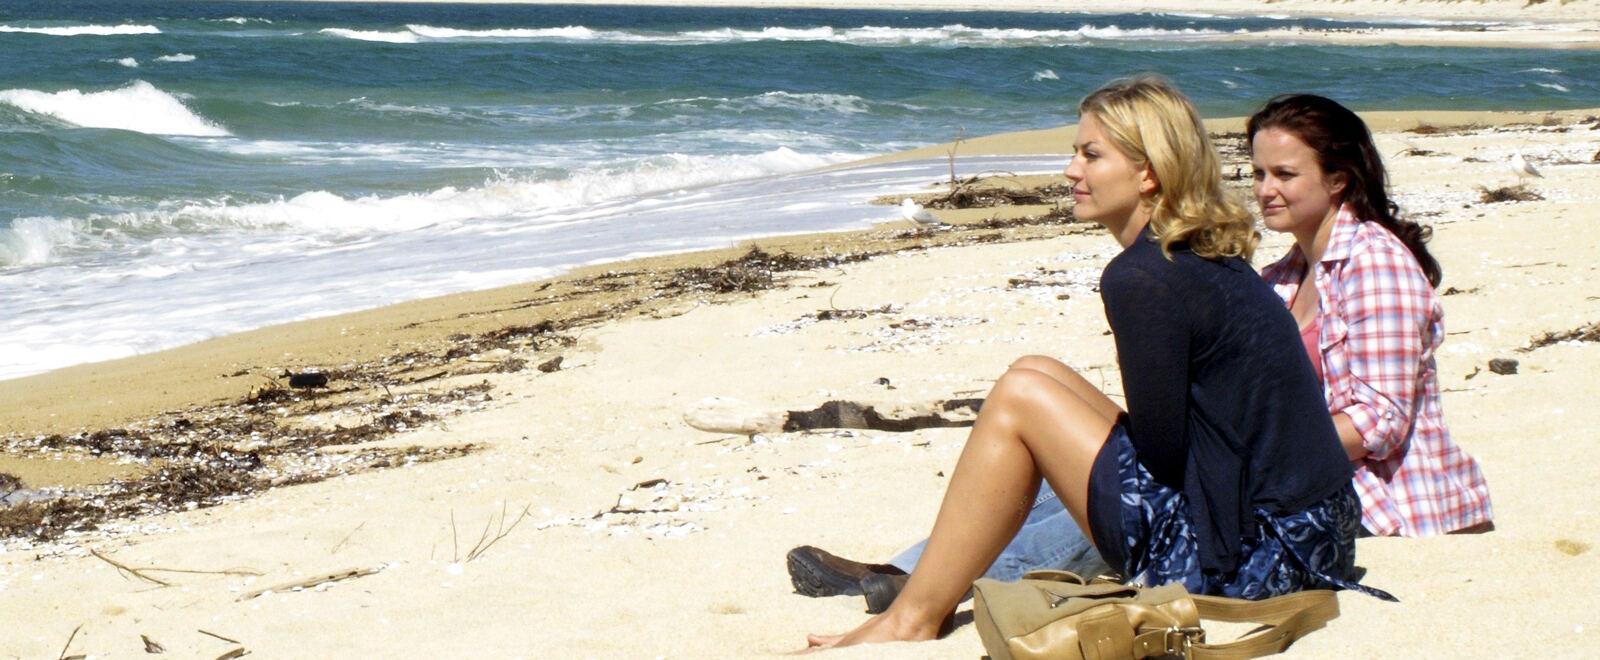 Emilie Richards - Nostalgia di Sandy Bay